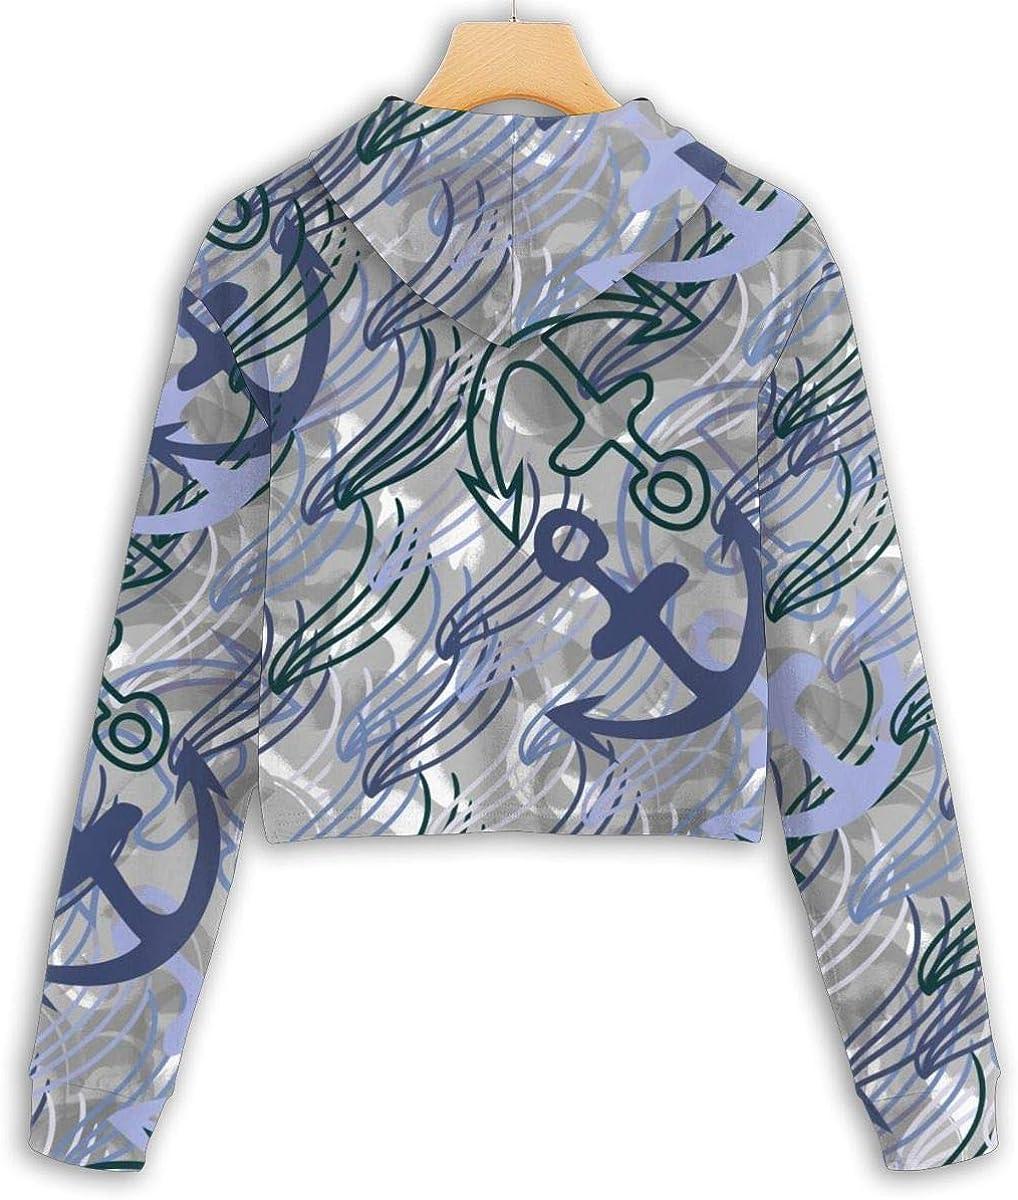 Seaweed and Anchors Pattern Cropped Hoodie,Womens Sweater,Women Long Sleeve Pullover Hooded Sweatshirt